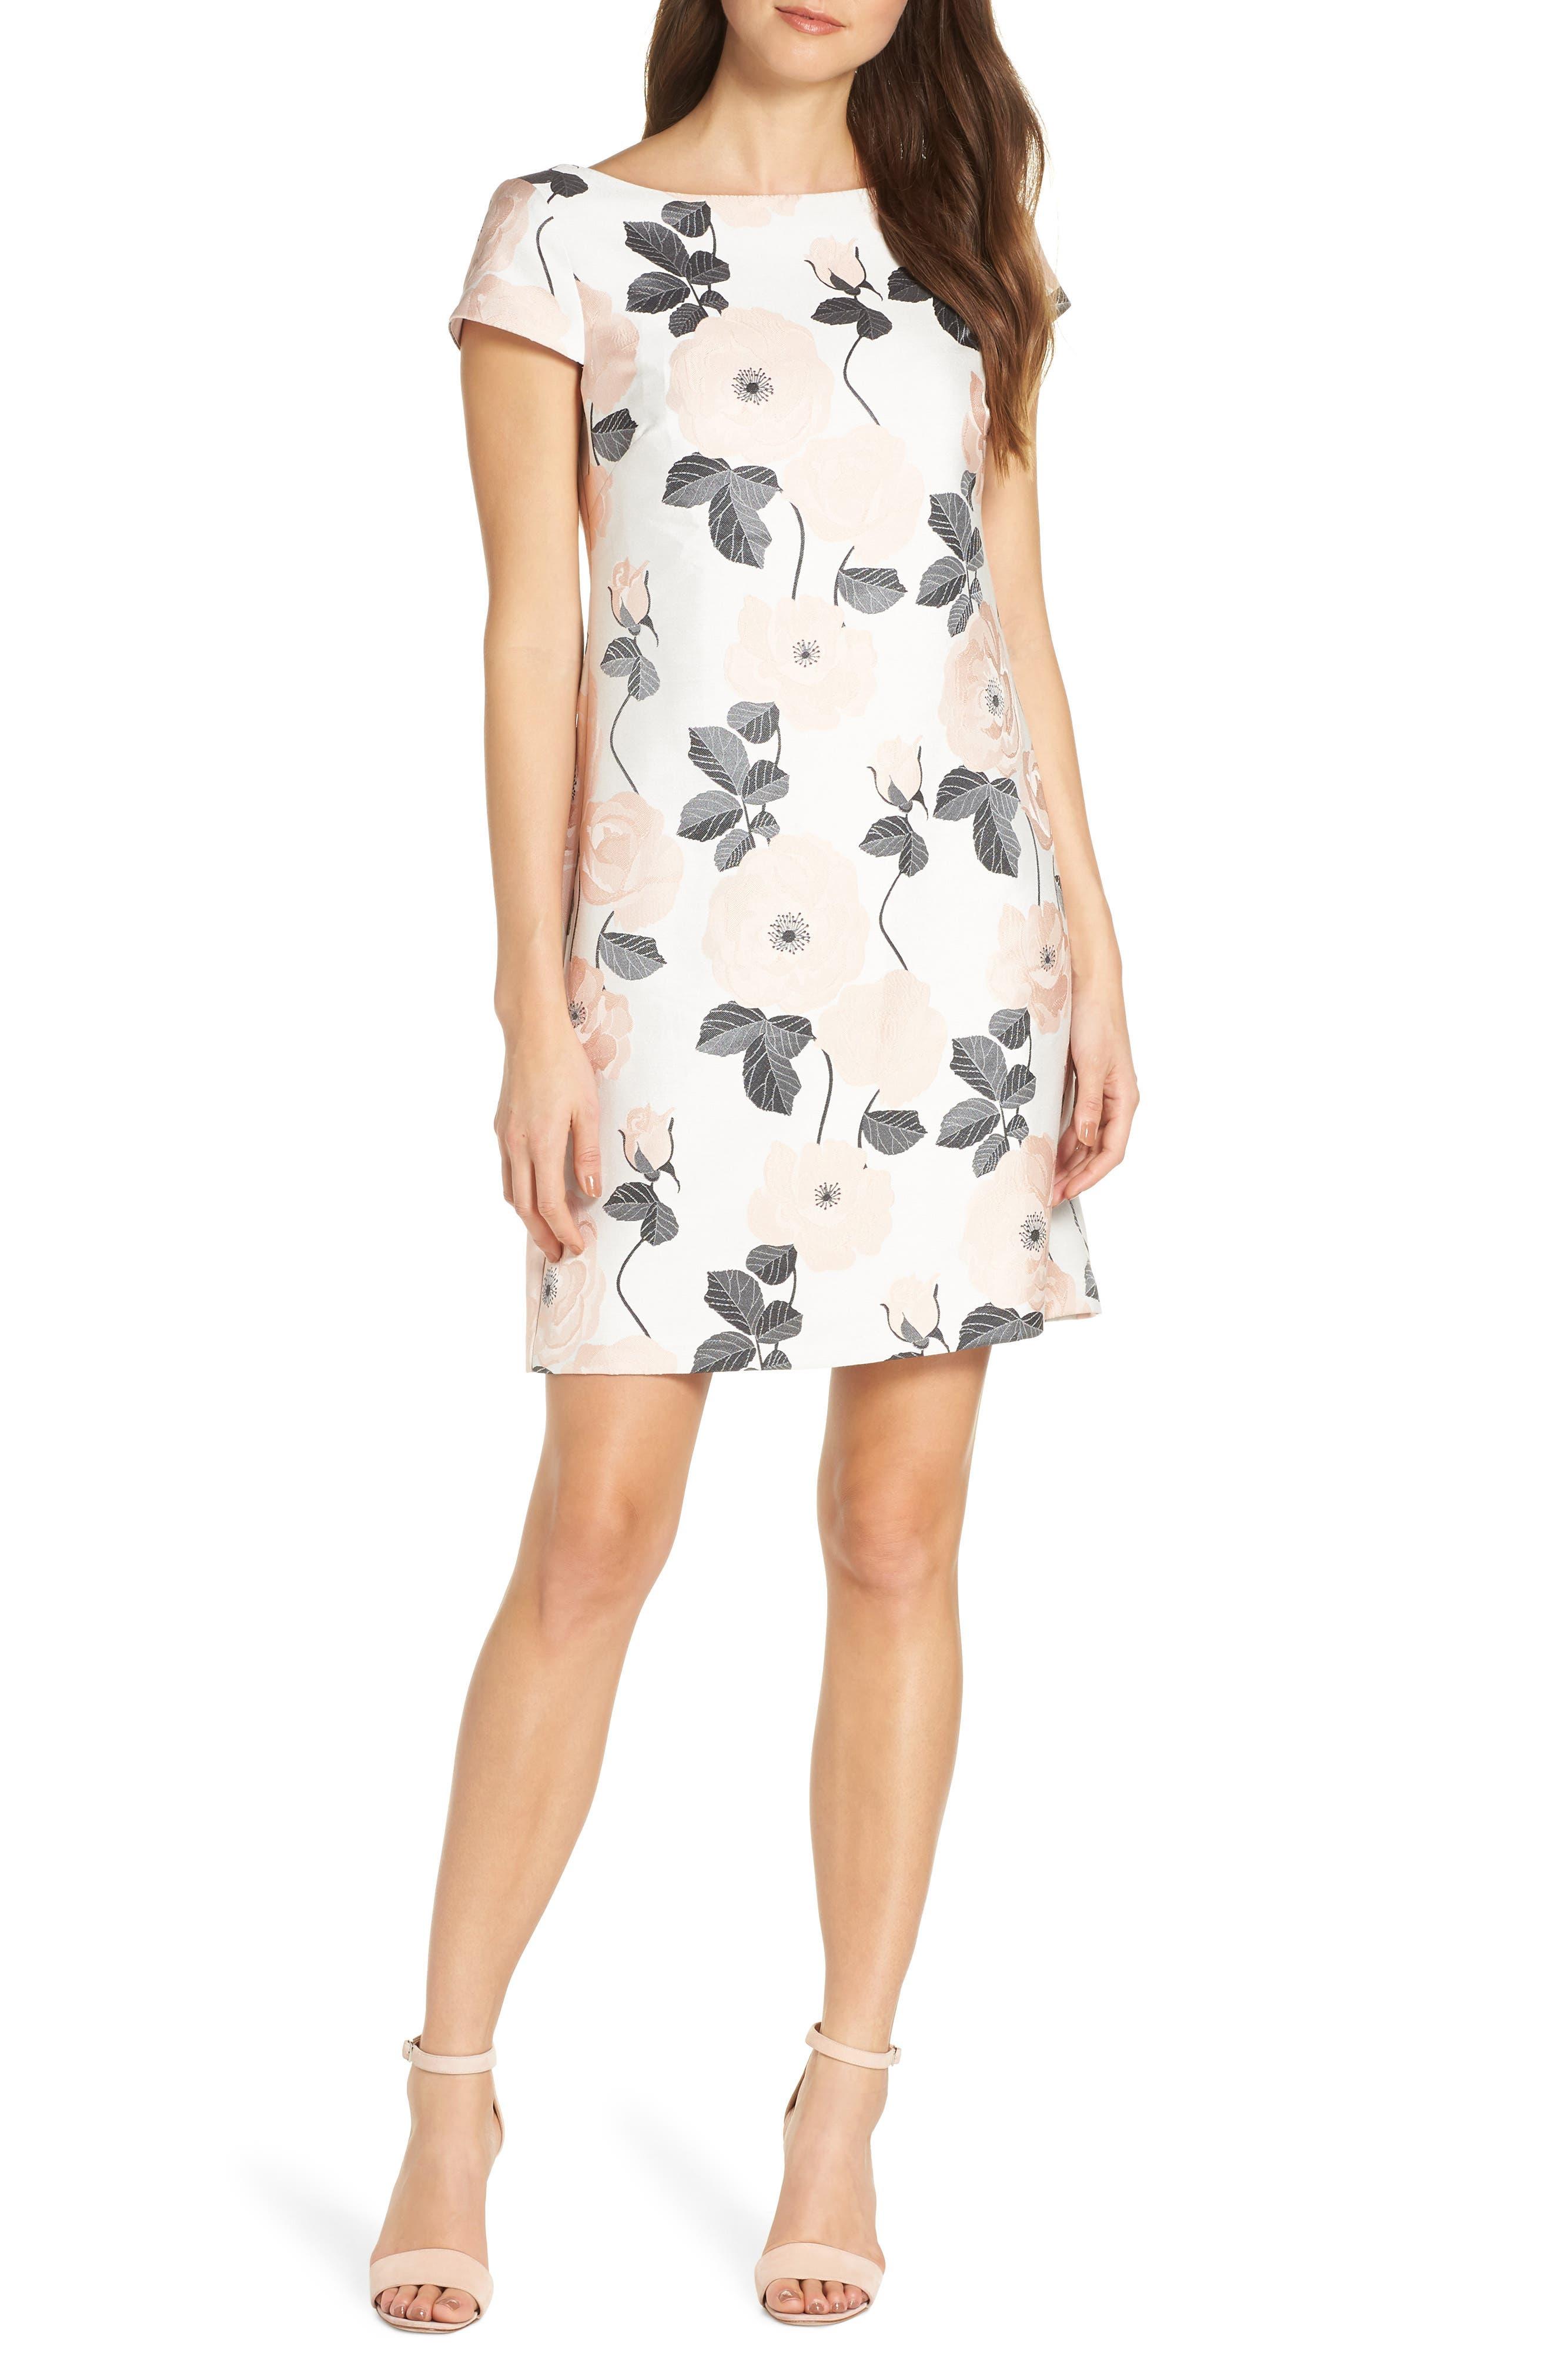 Vince Camuto Floral Jacquard Shift Dress, White